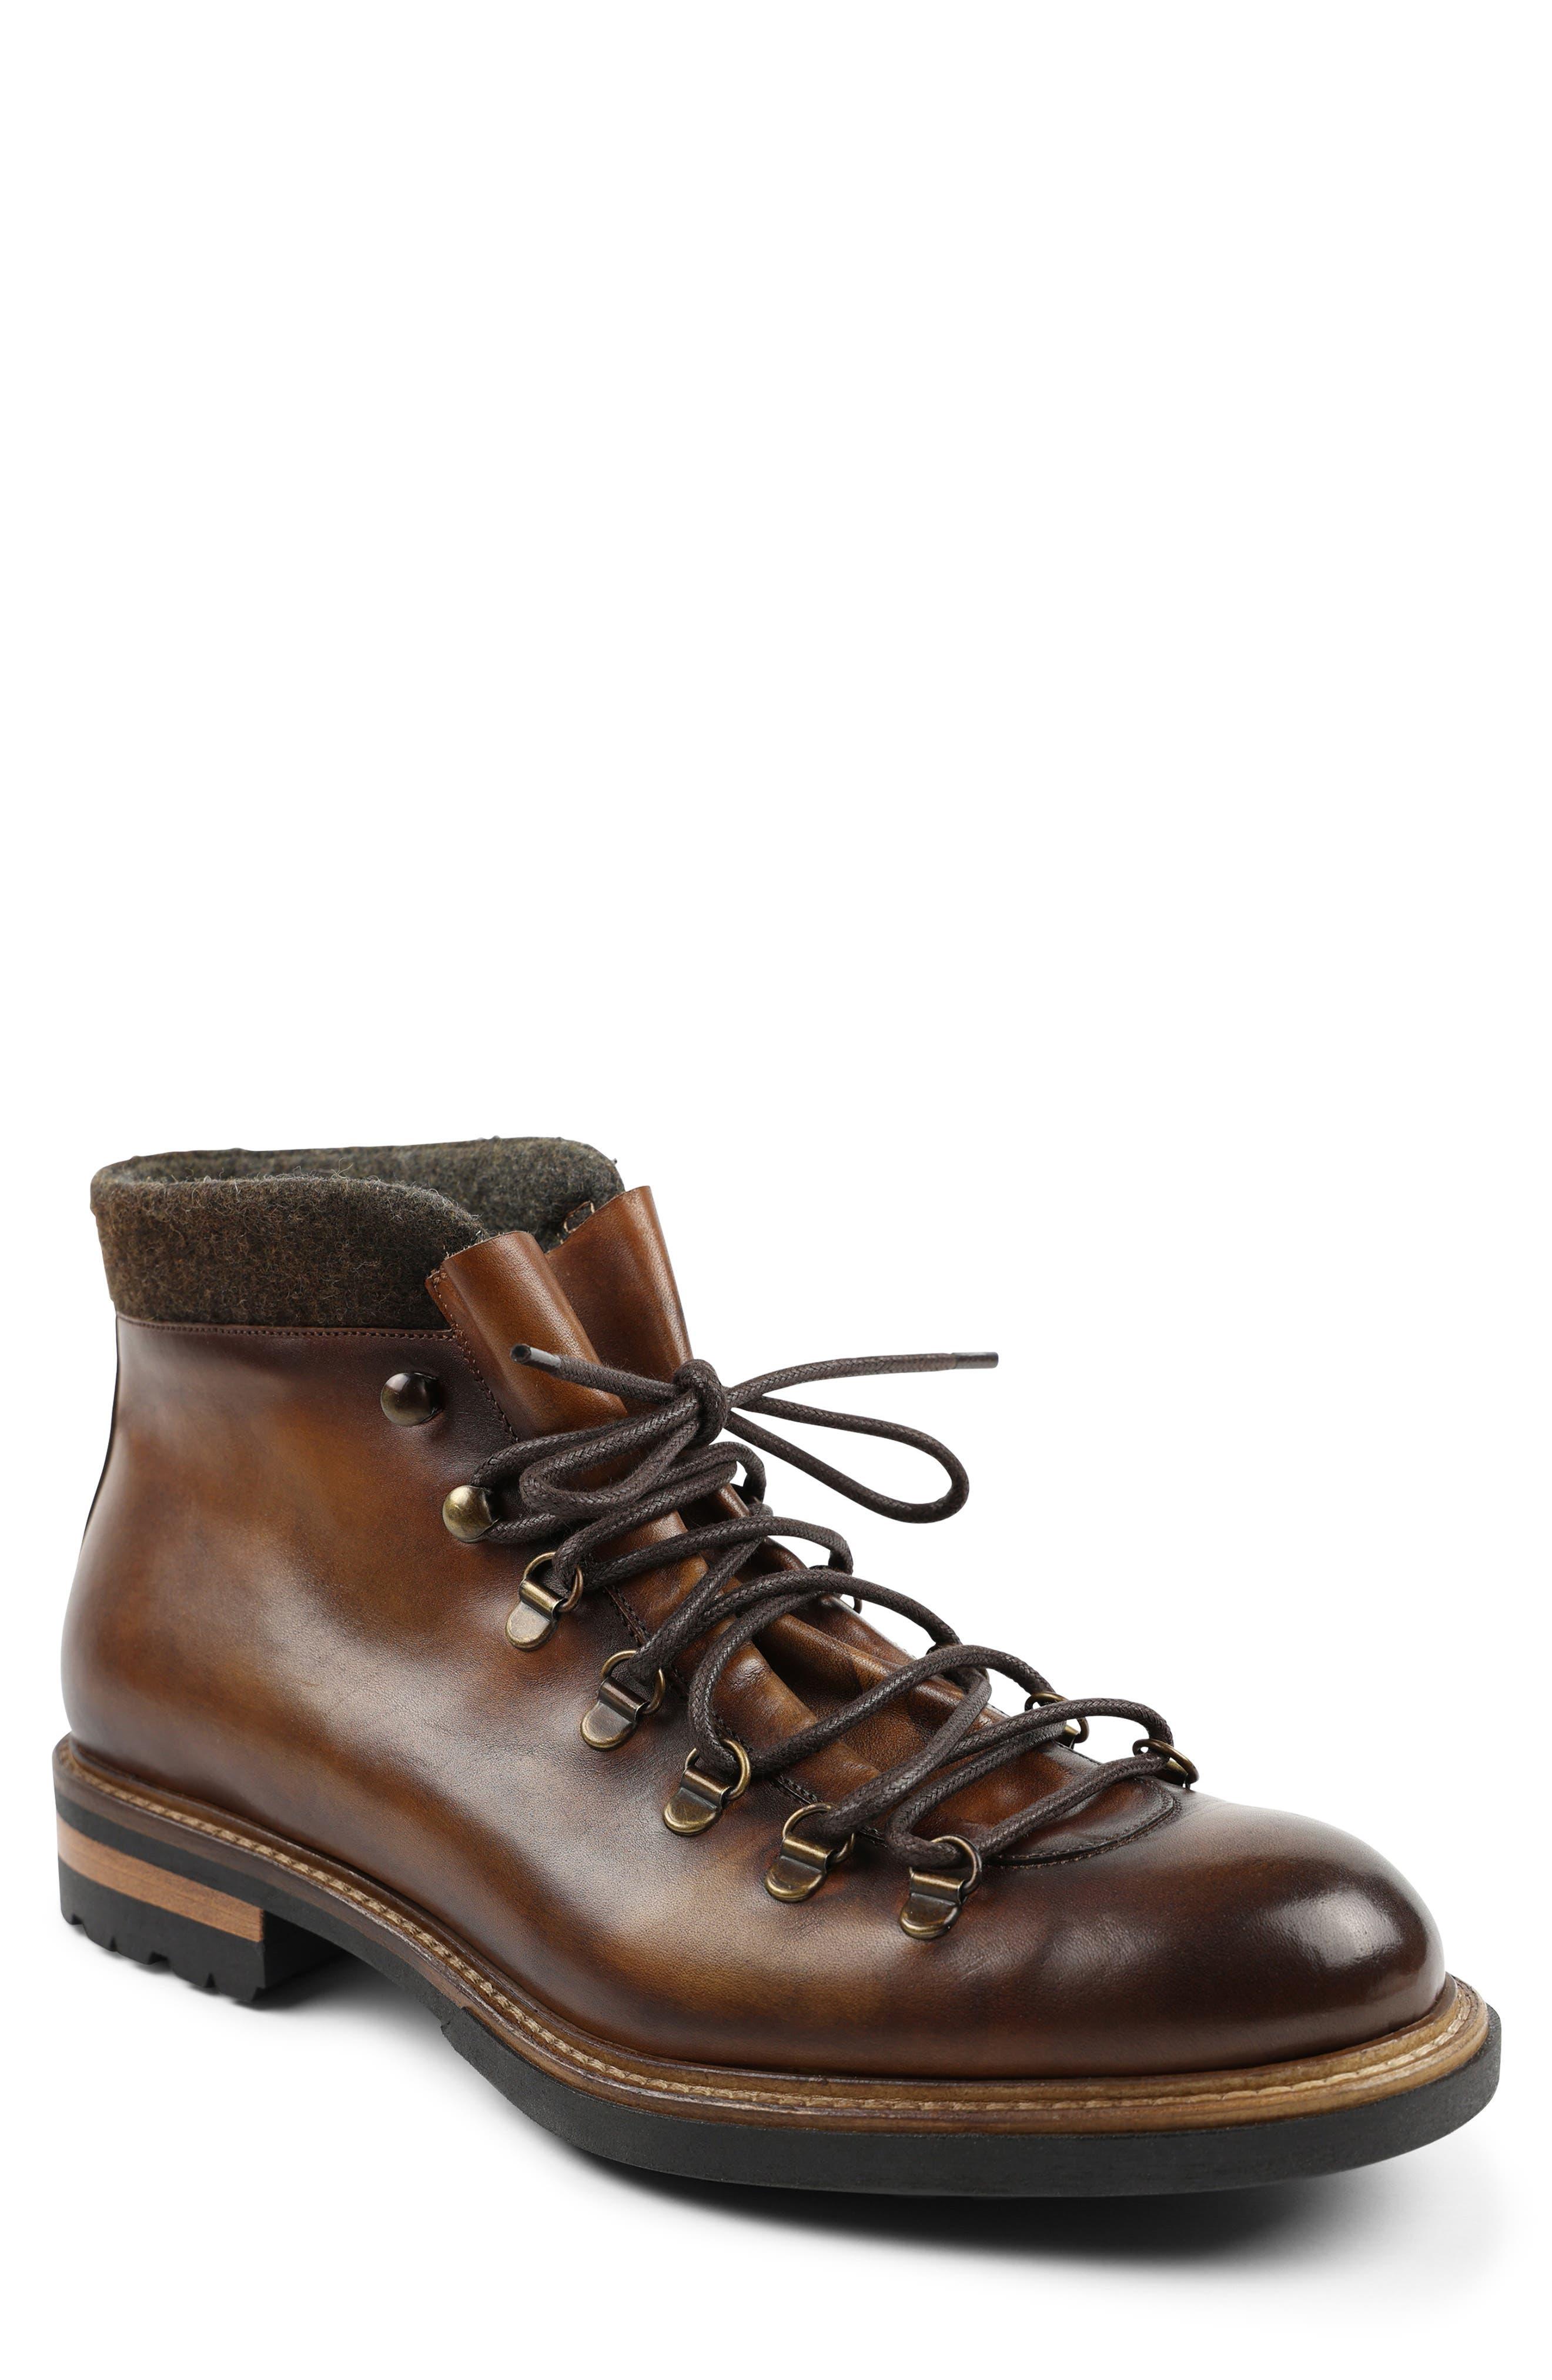 Andez Plain Toe Boot